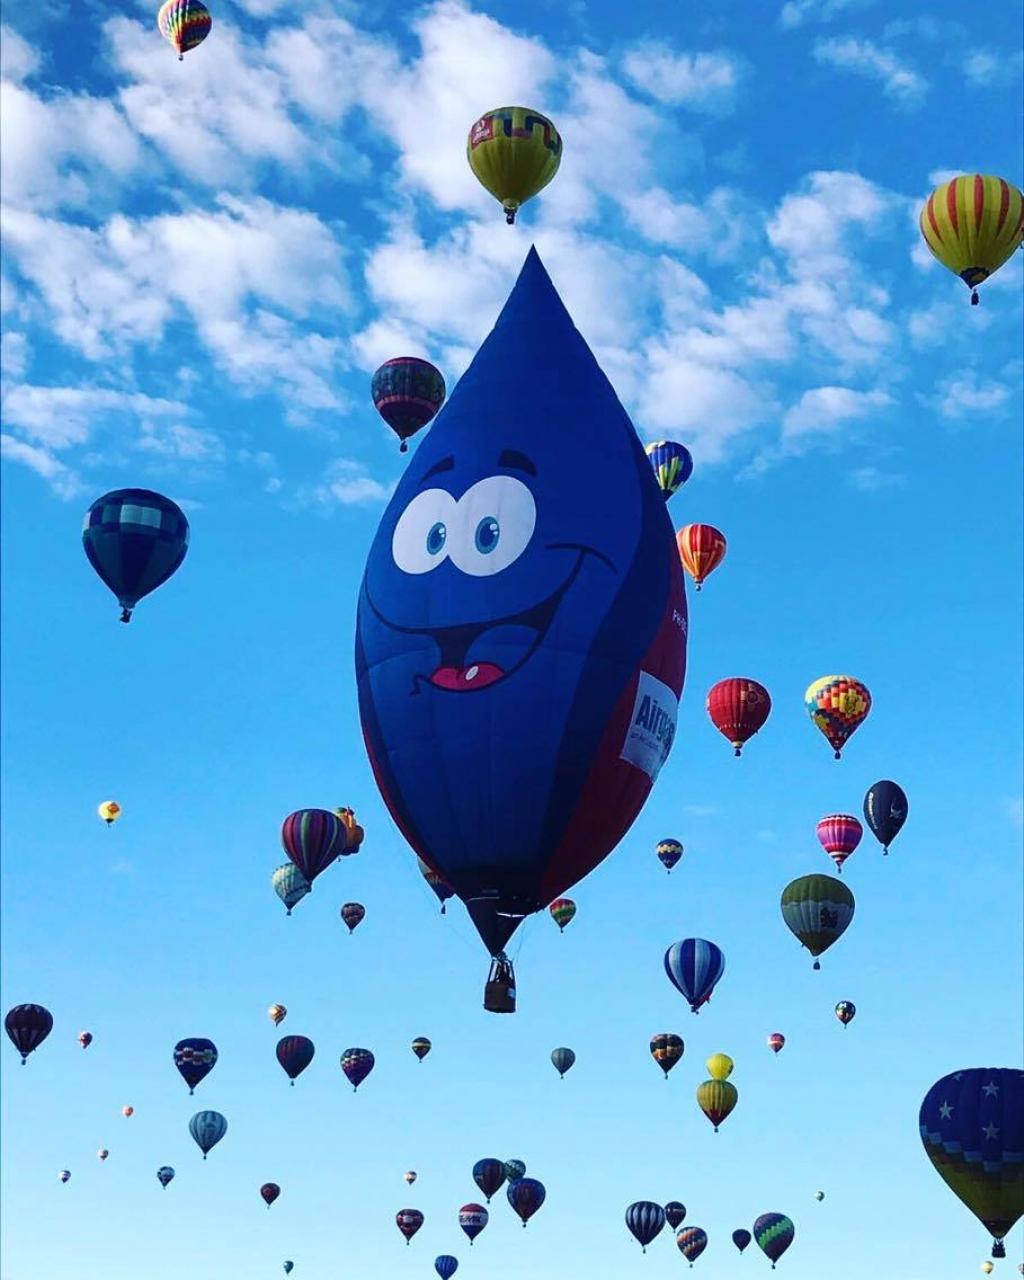 Albuquerque Volkswagen: Albuquerque International Balloon Fiesta